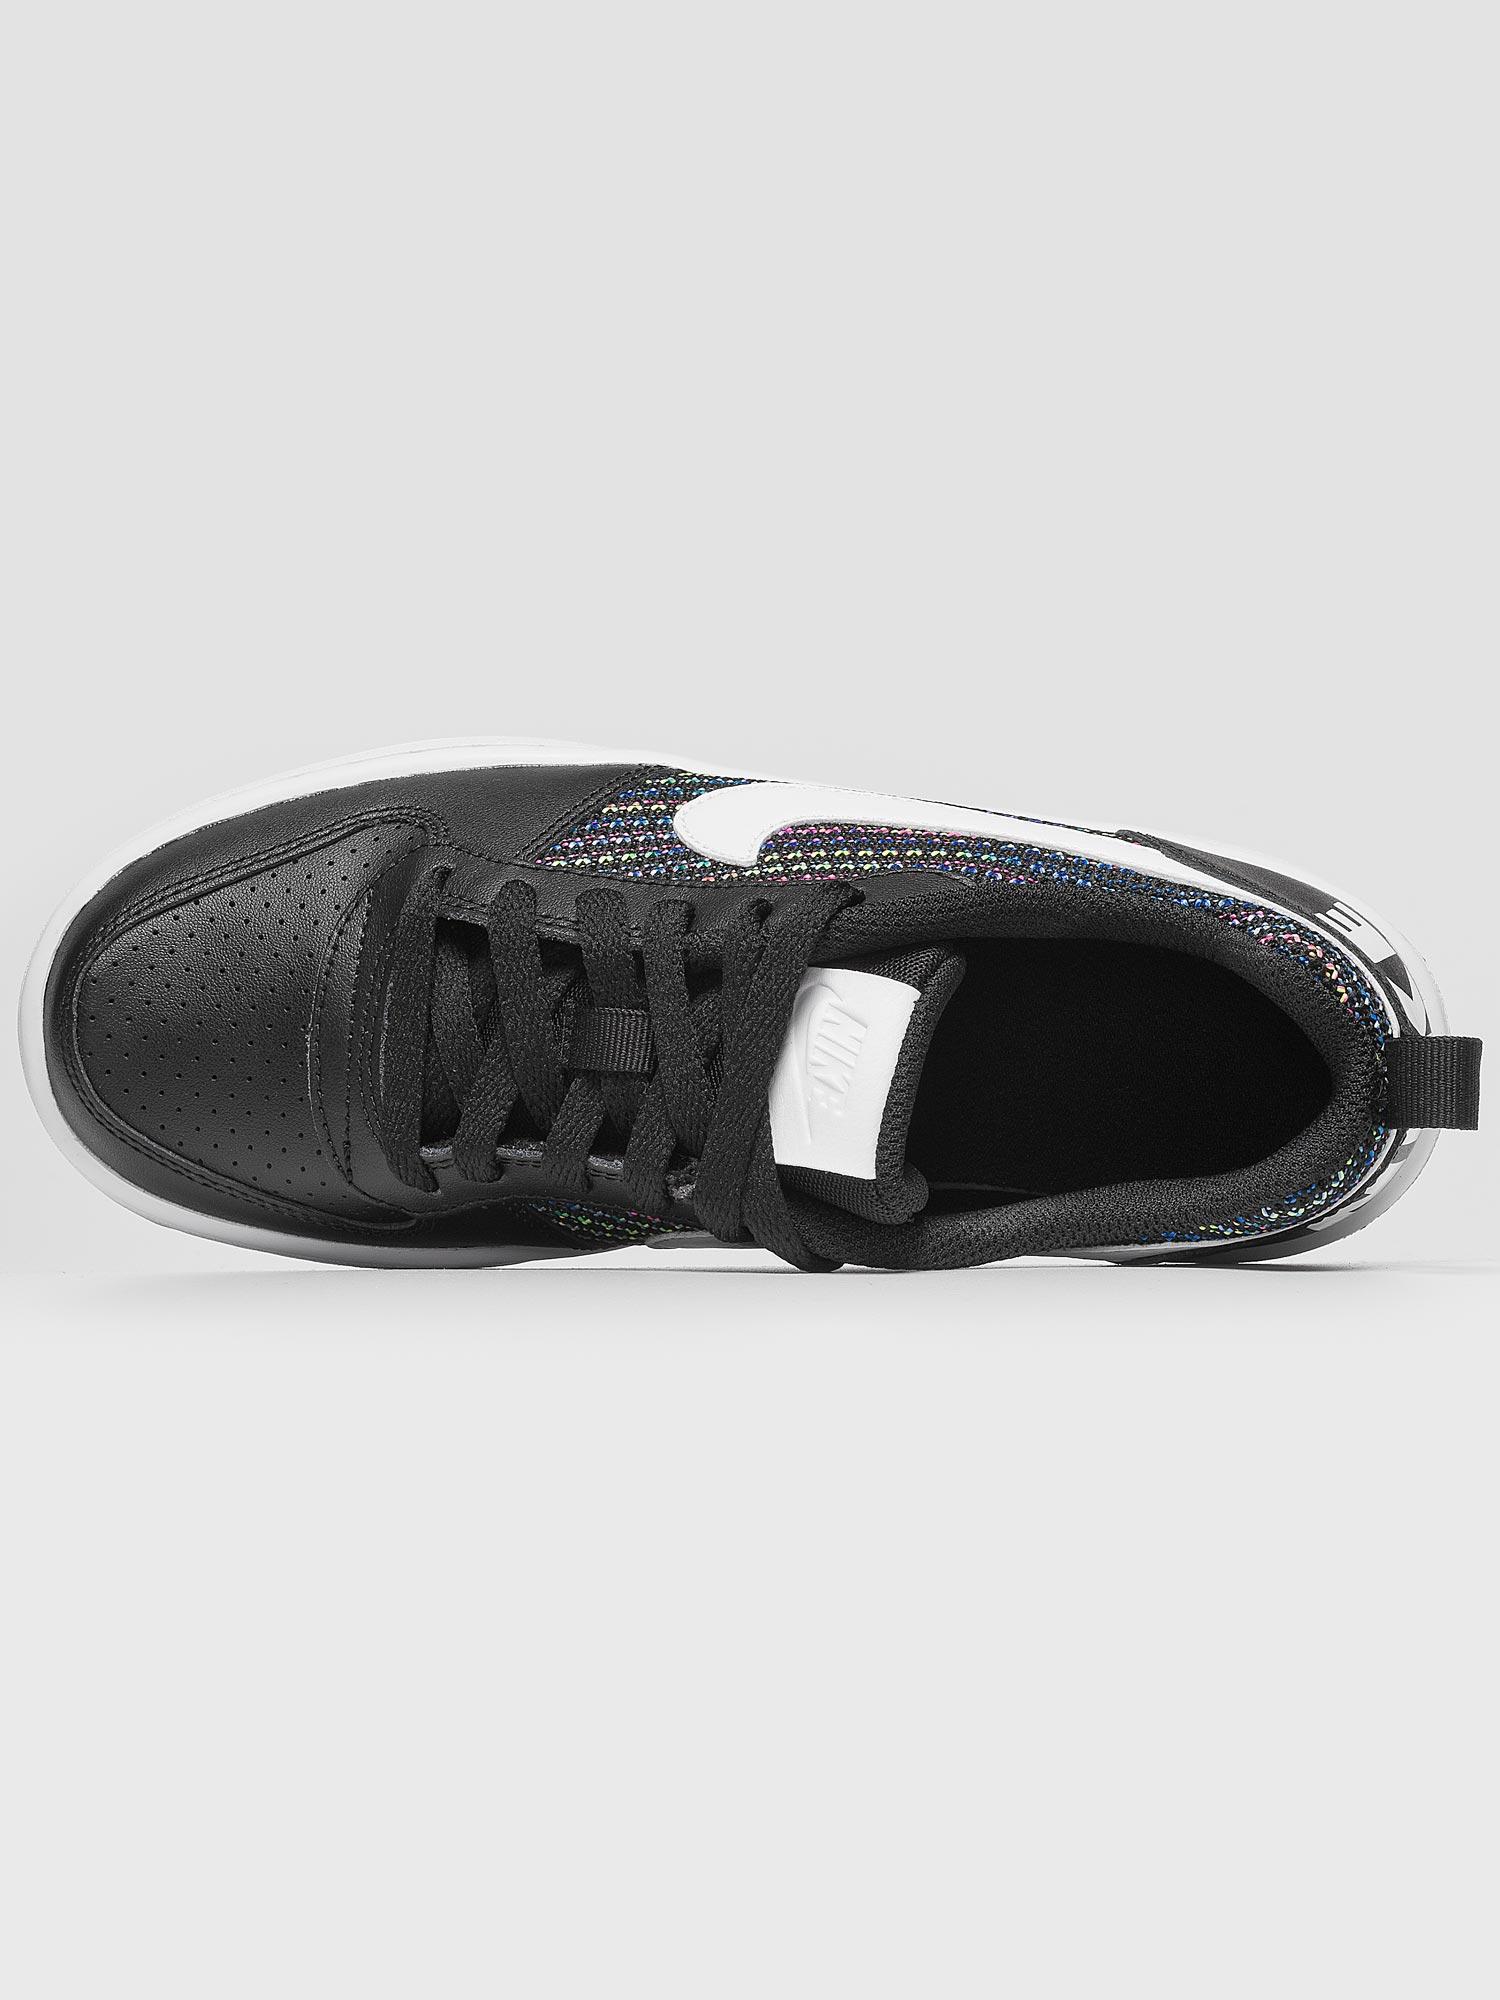 Nike Court Borough Low Se GS Scarpe Sneakers Nero Bianco Multicolor ... 430d9b6f59fd4